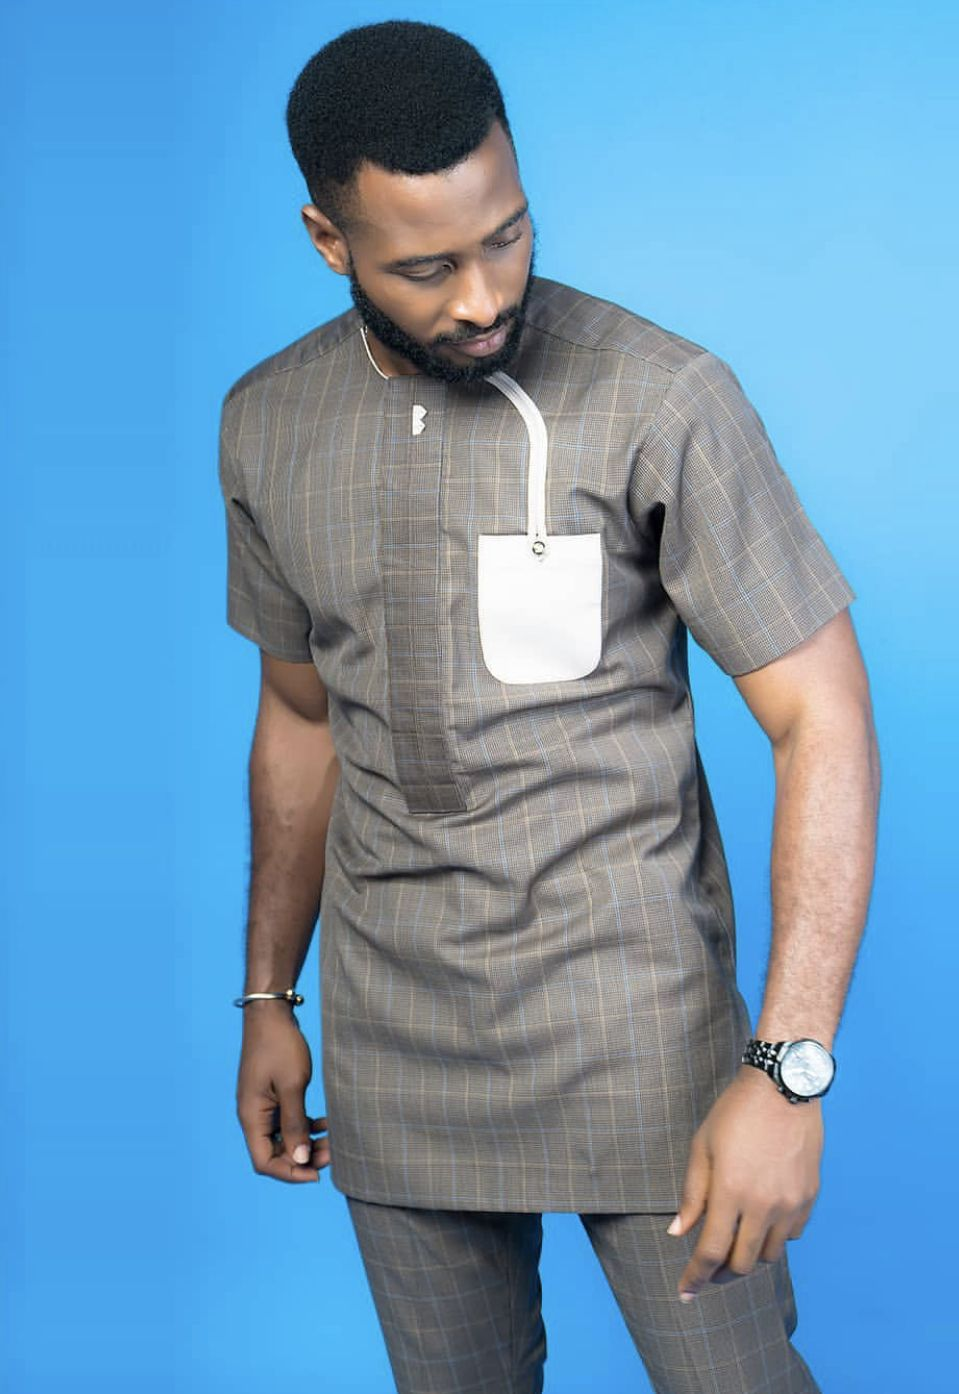 Cossly African Shirts For Men African Clothing For Men Designer Clothes For Men,Transitional Design Style Bedroom